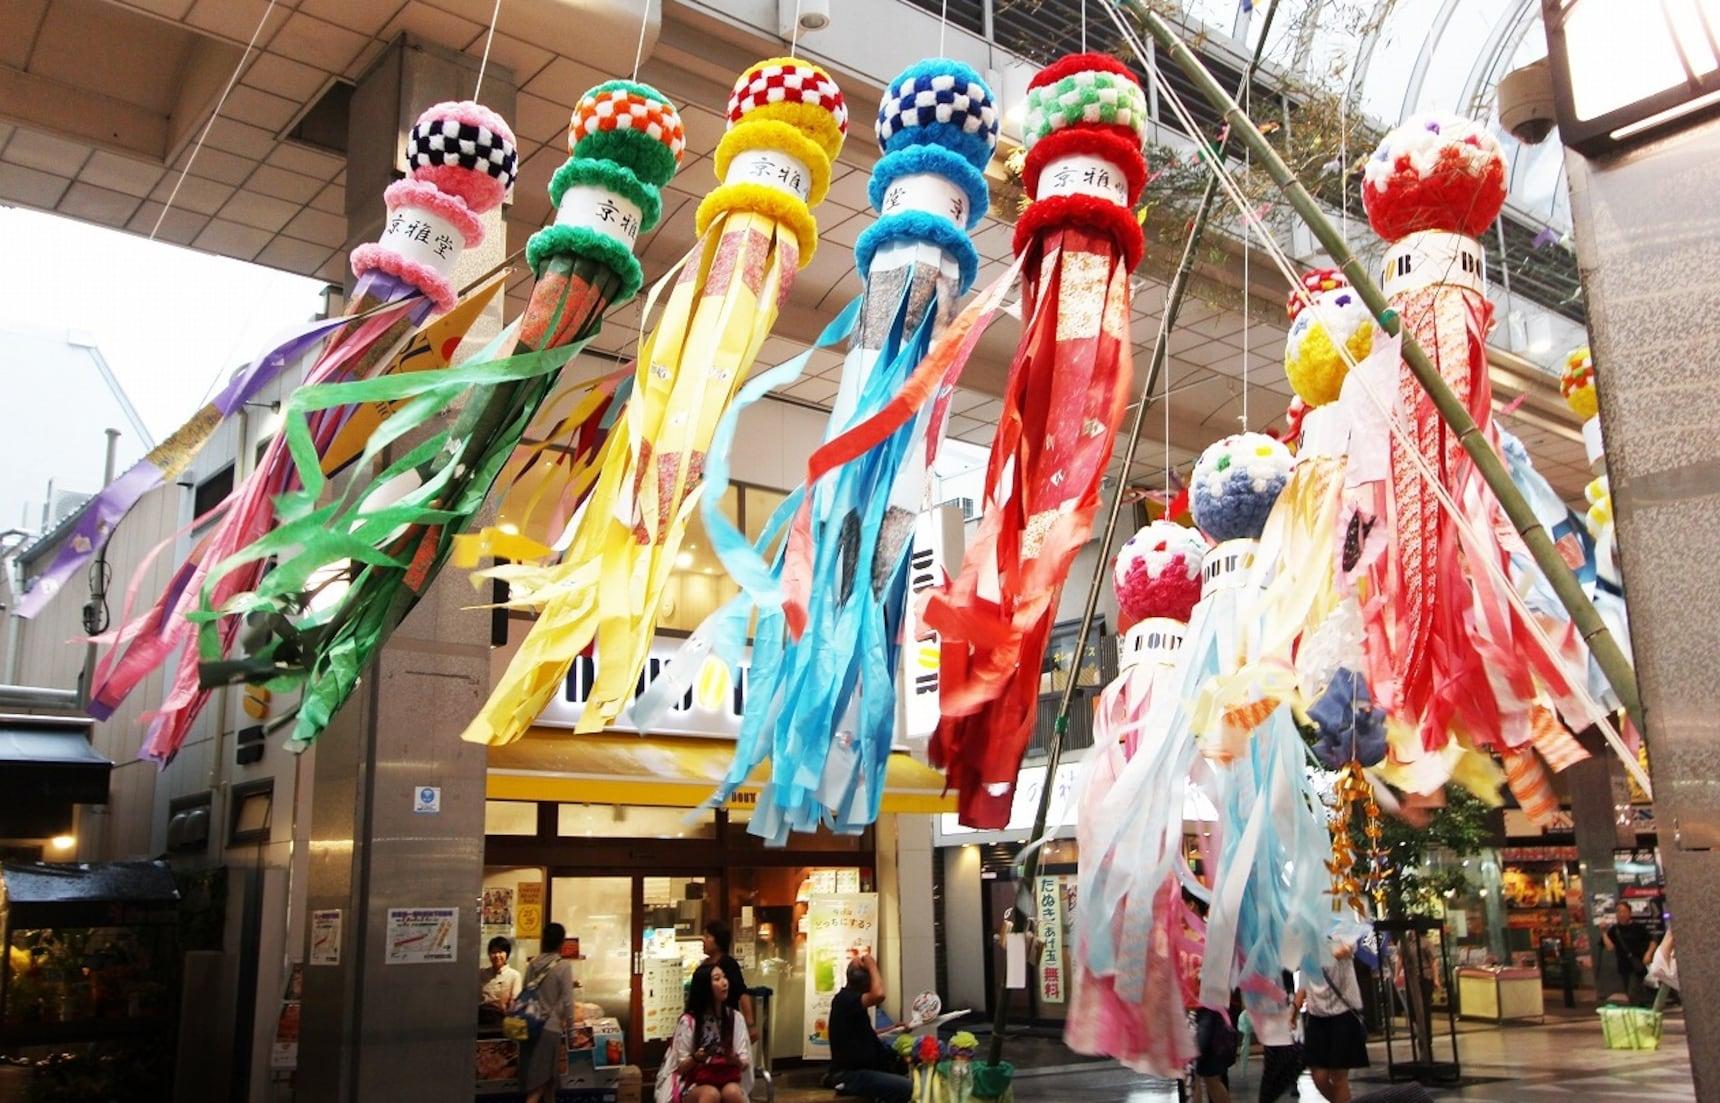 The Sendai Tanabata Star Festival